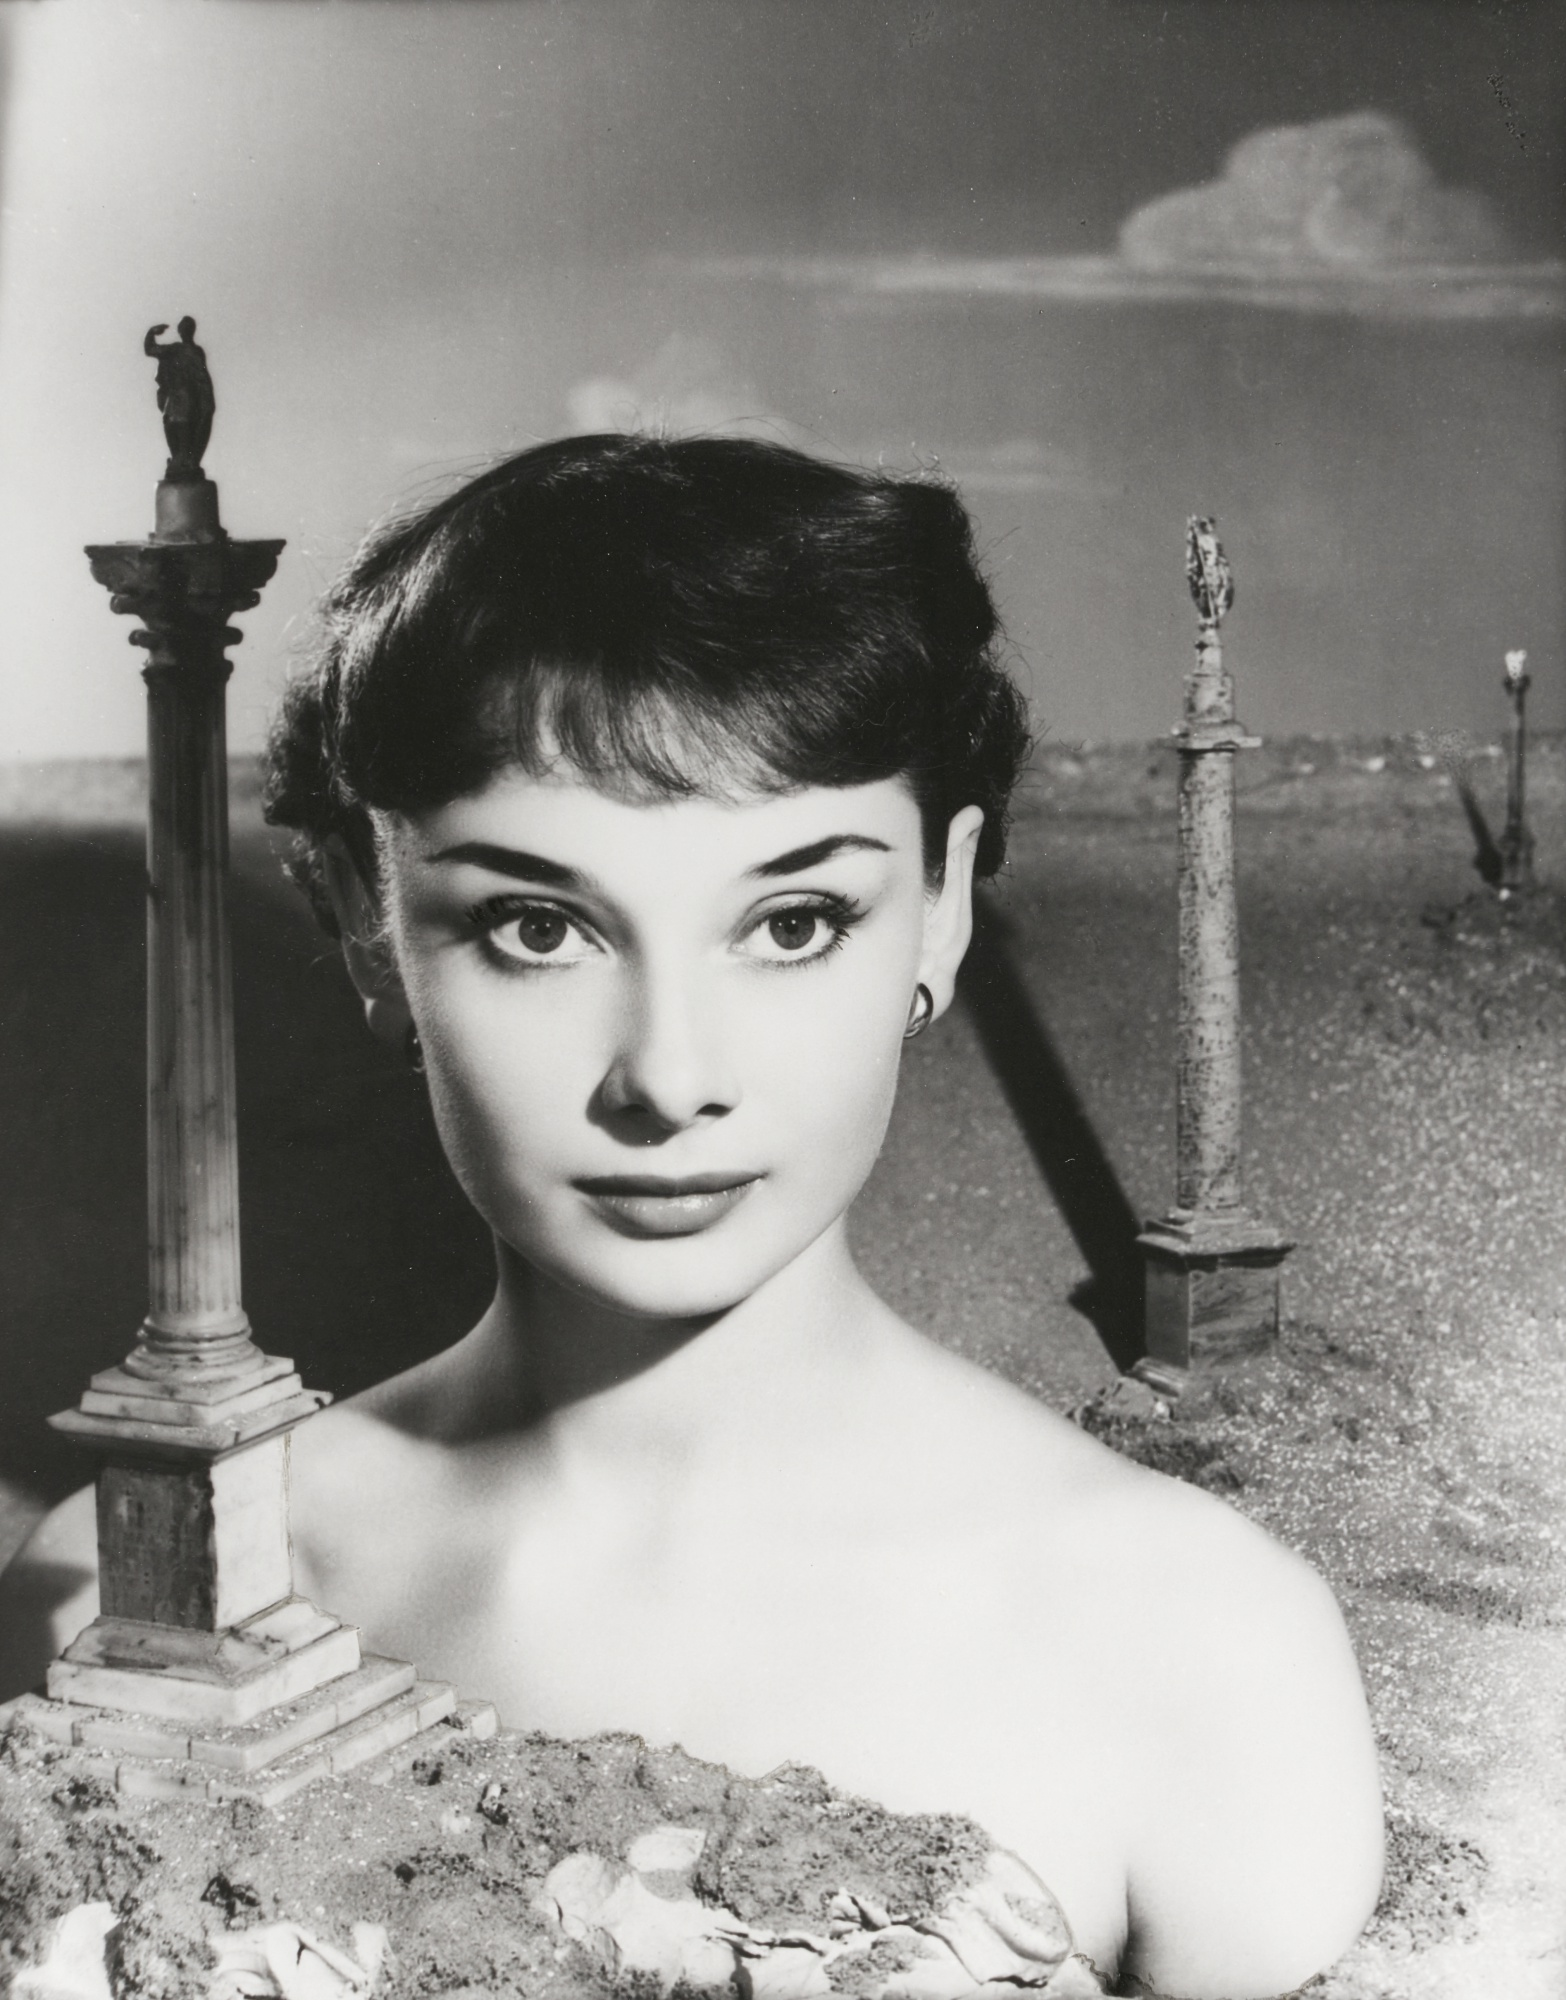 Angus McBean-Audrey Hepburn, 1949 Vivien Leigh, 1938-1949